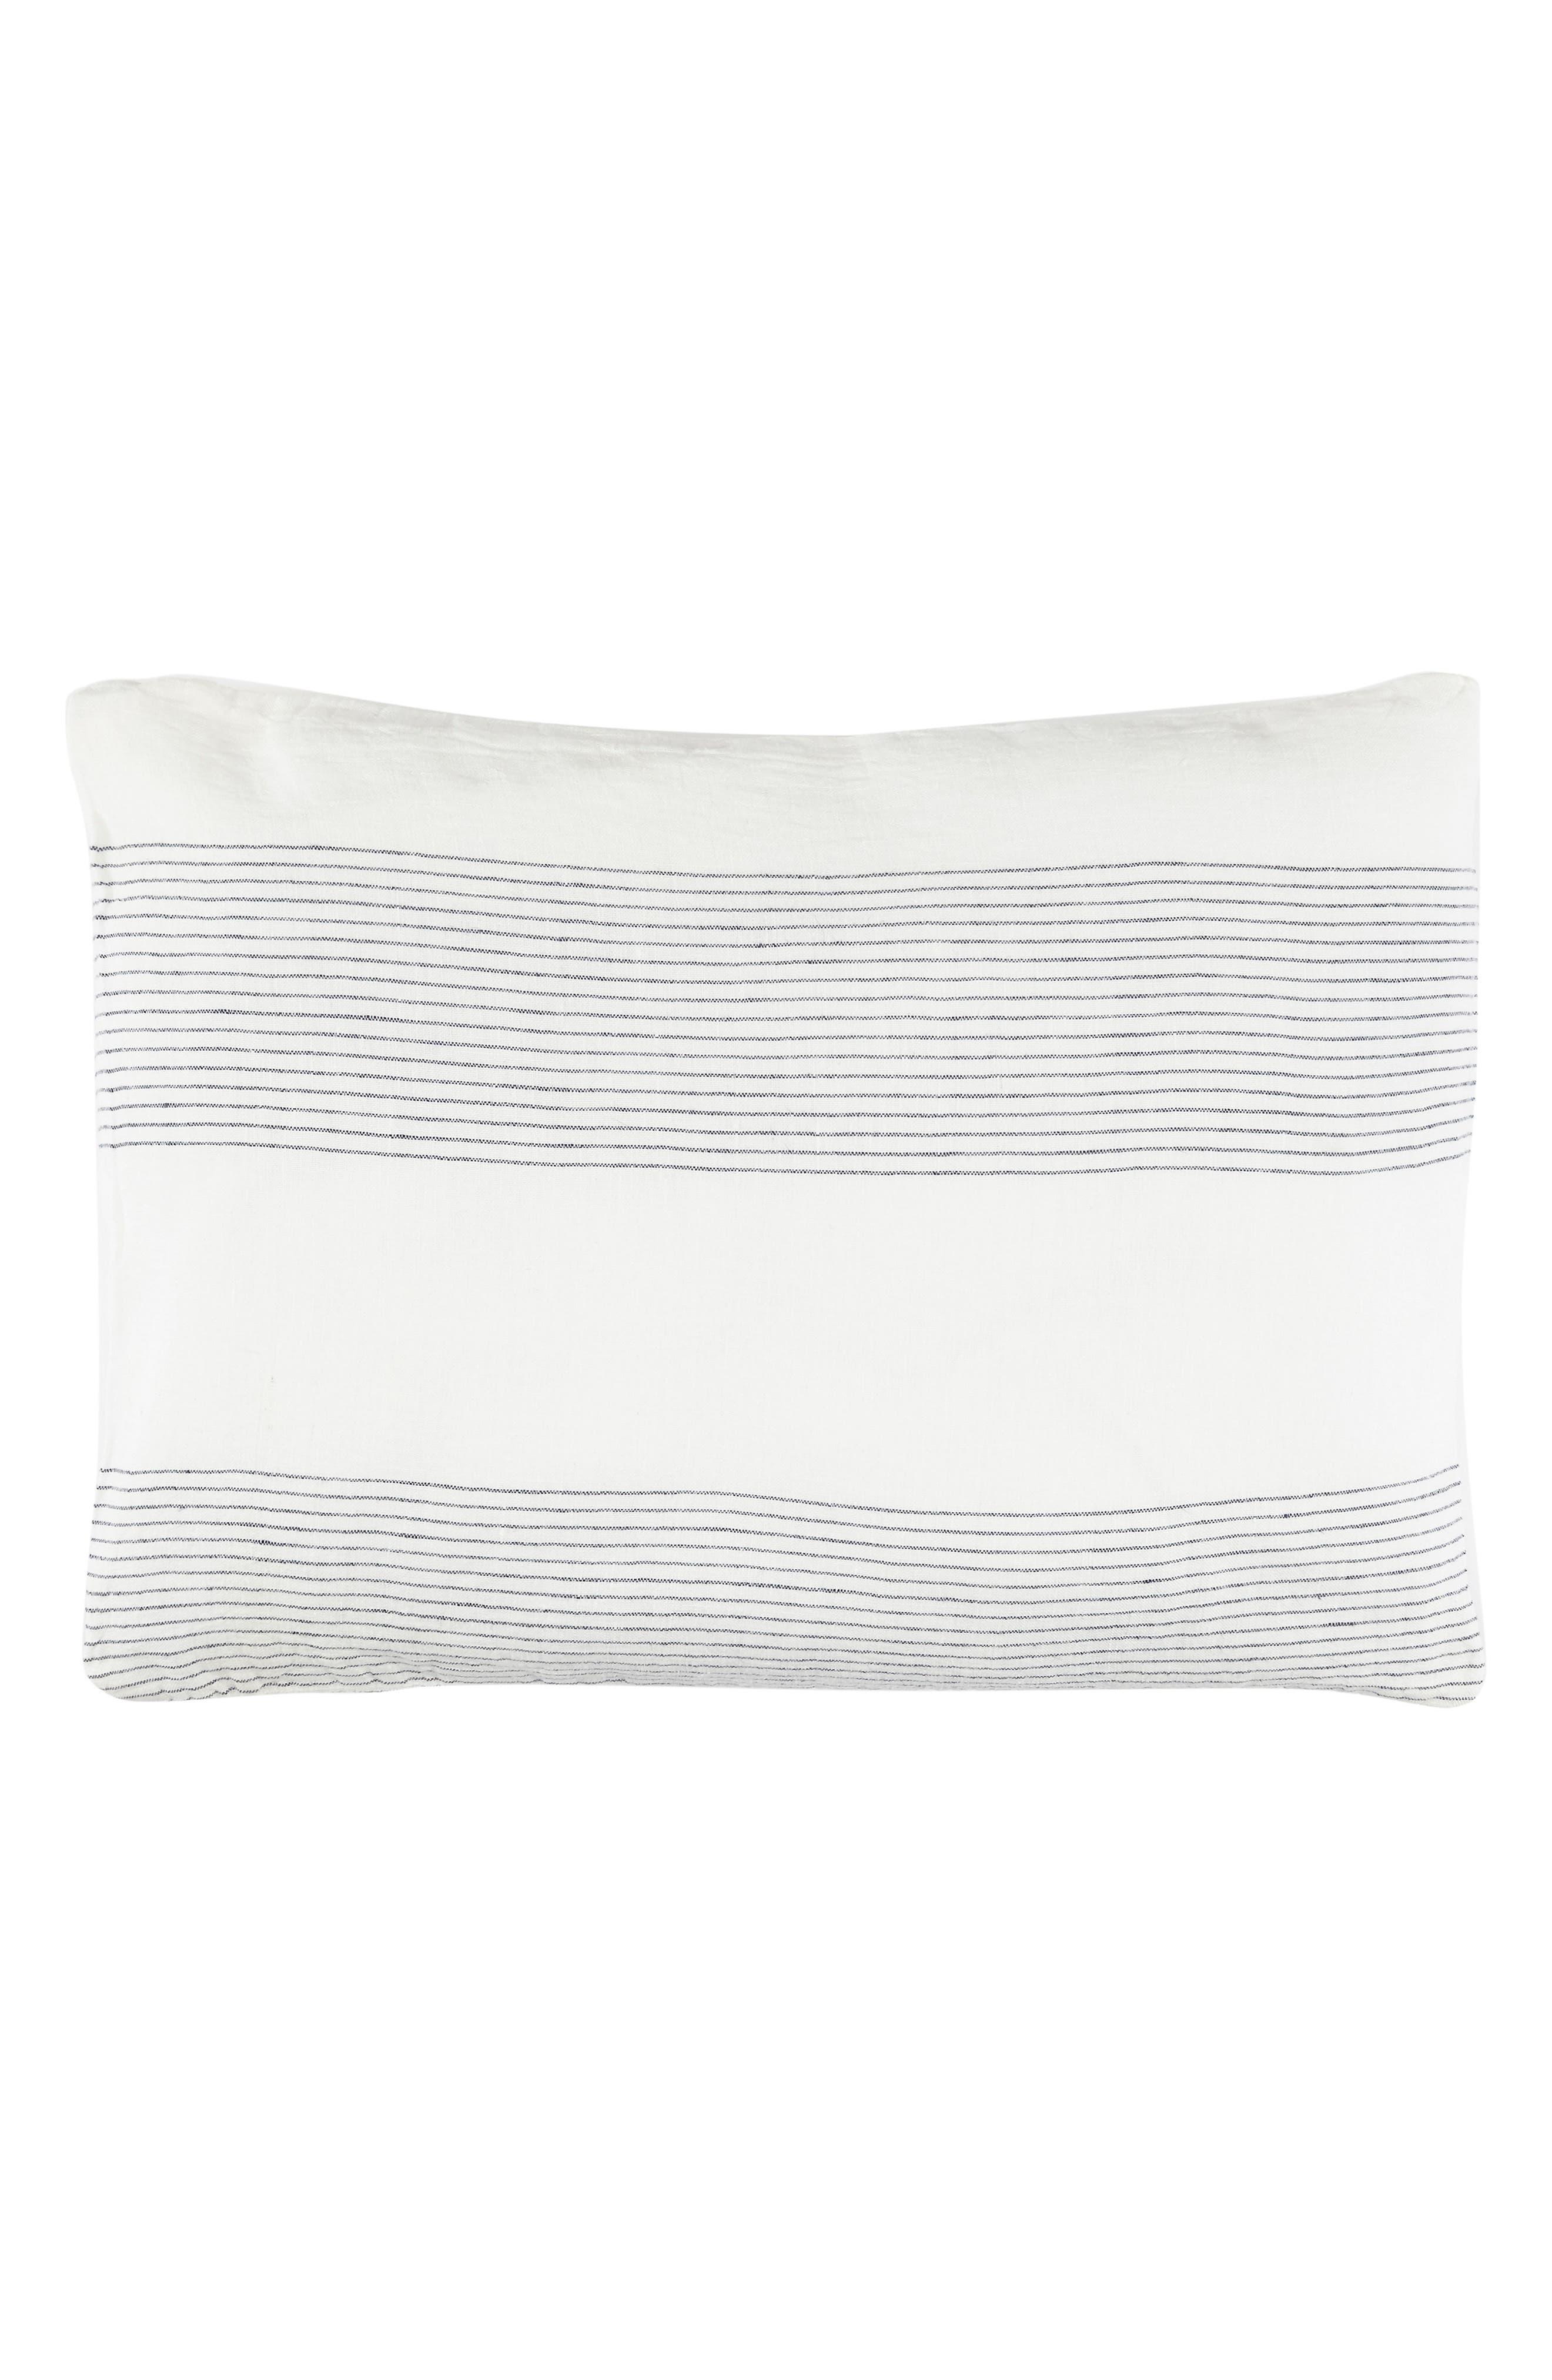 Alternate Image 1 Selected - KASSATEX Amagansett Linen Accent Pillow